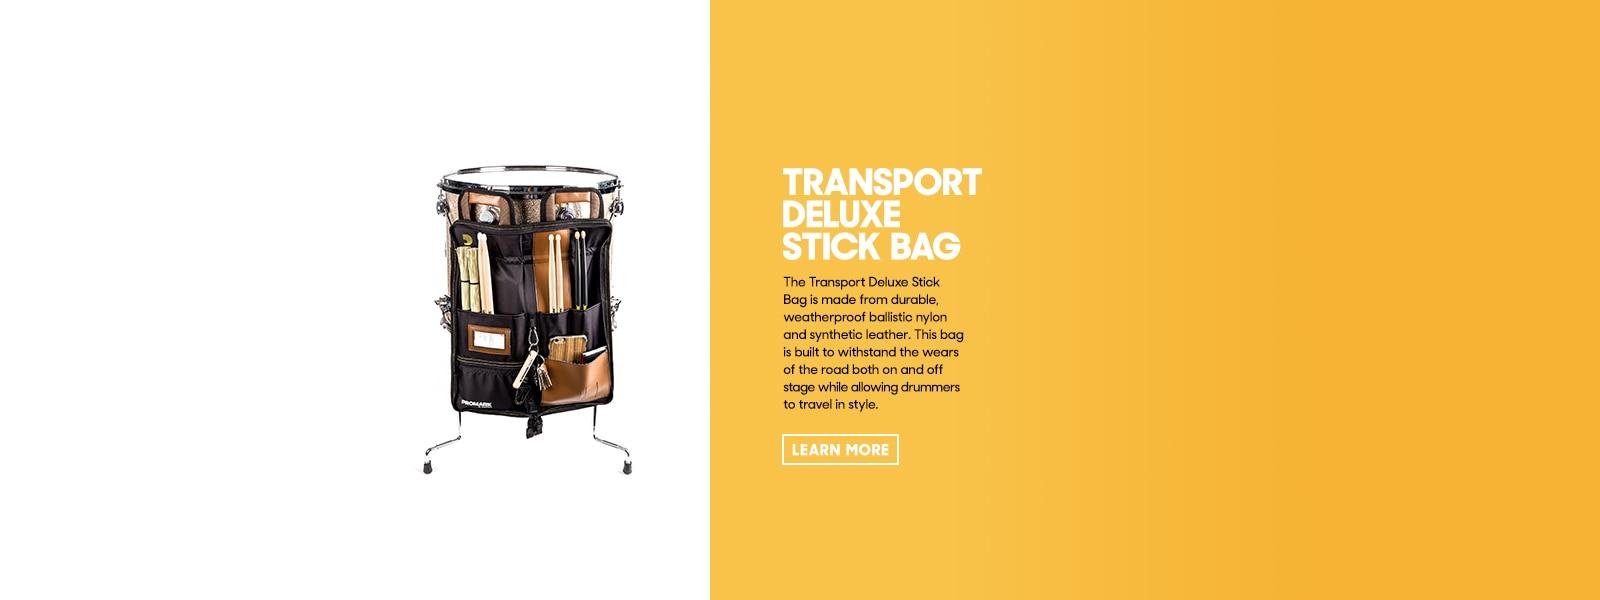 Transport deluxe stick bag